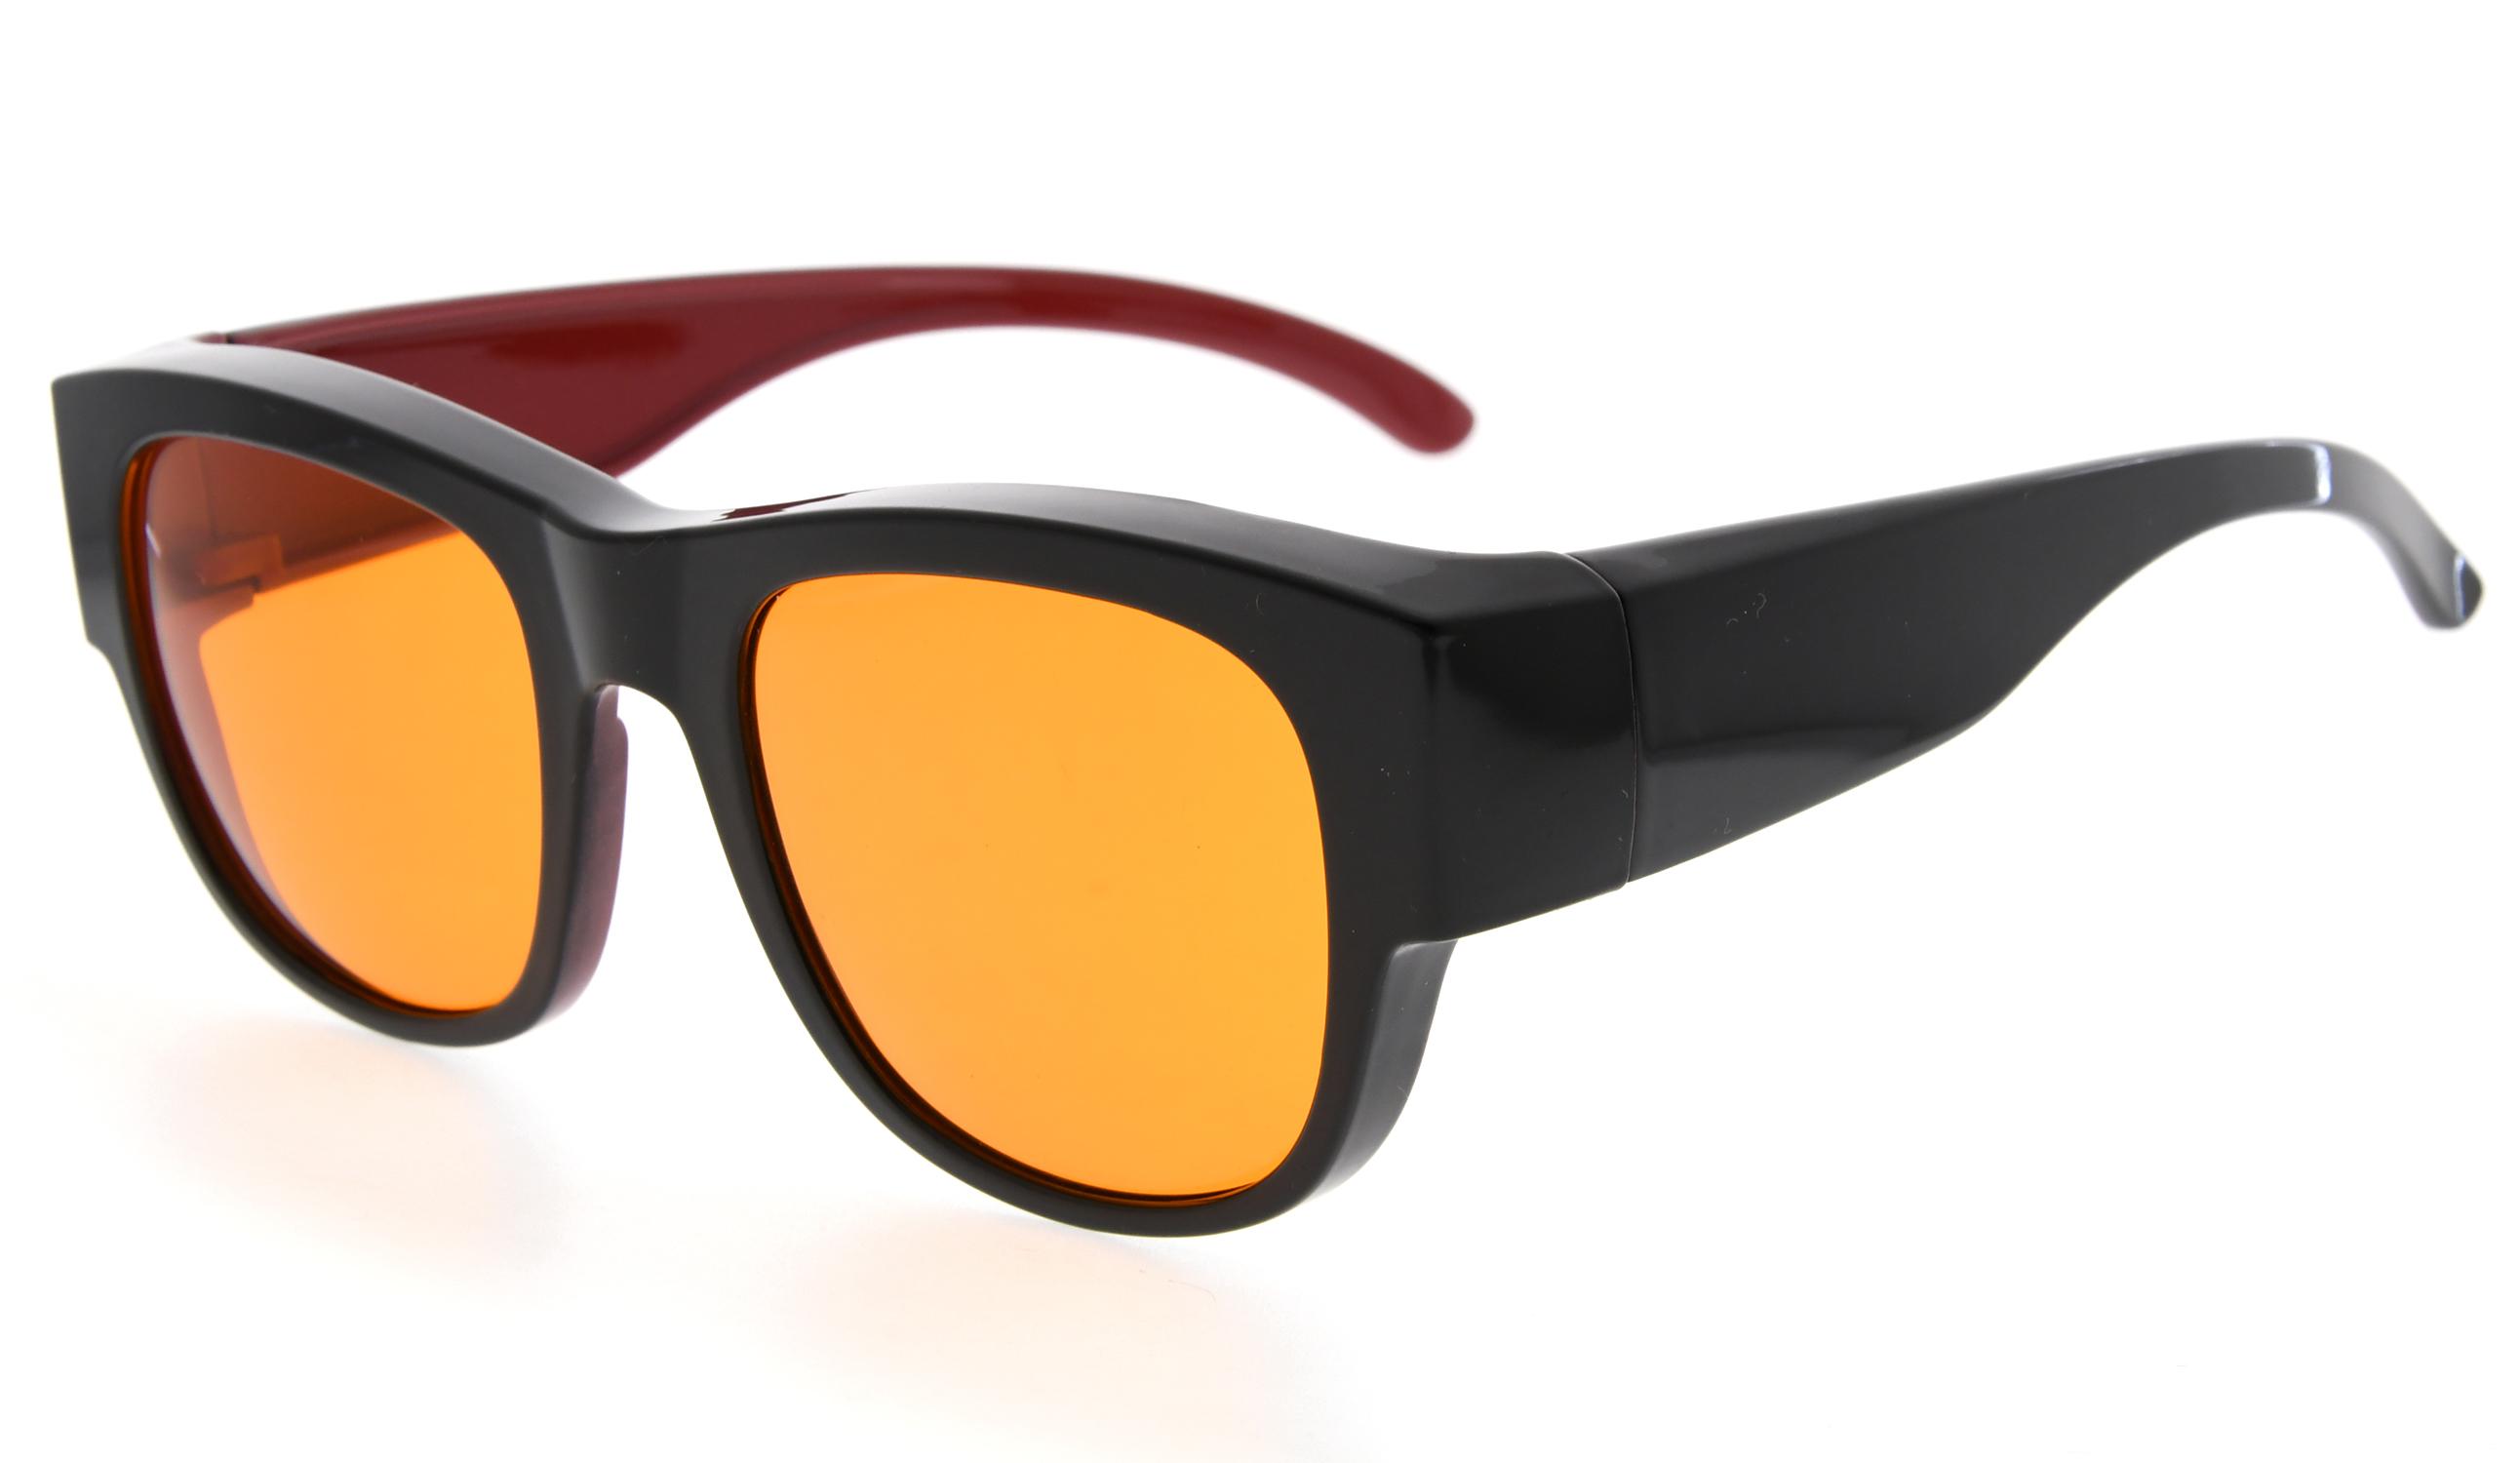 67cd9d6efeff Eyekepper Fit over Computer Glasses Block 100% Blue Light and Anti-UV for Sunshine  Readers Black-Red DSXM1802